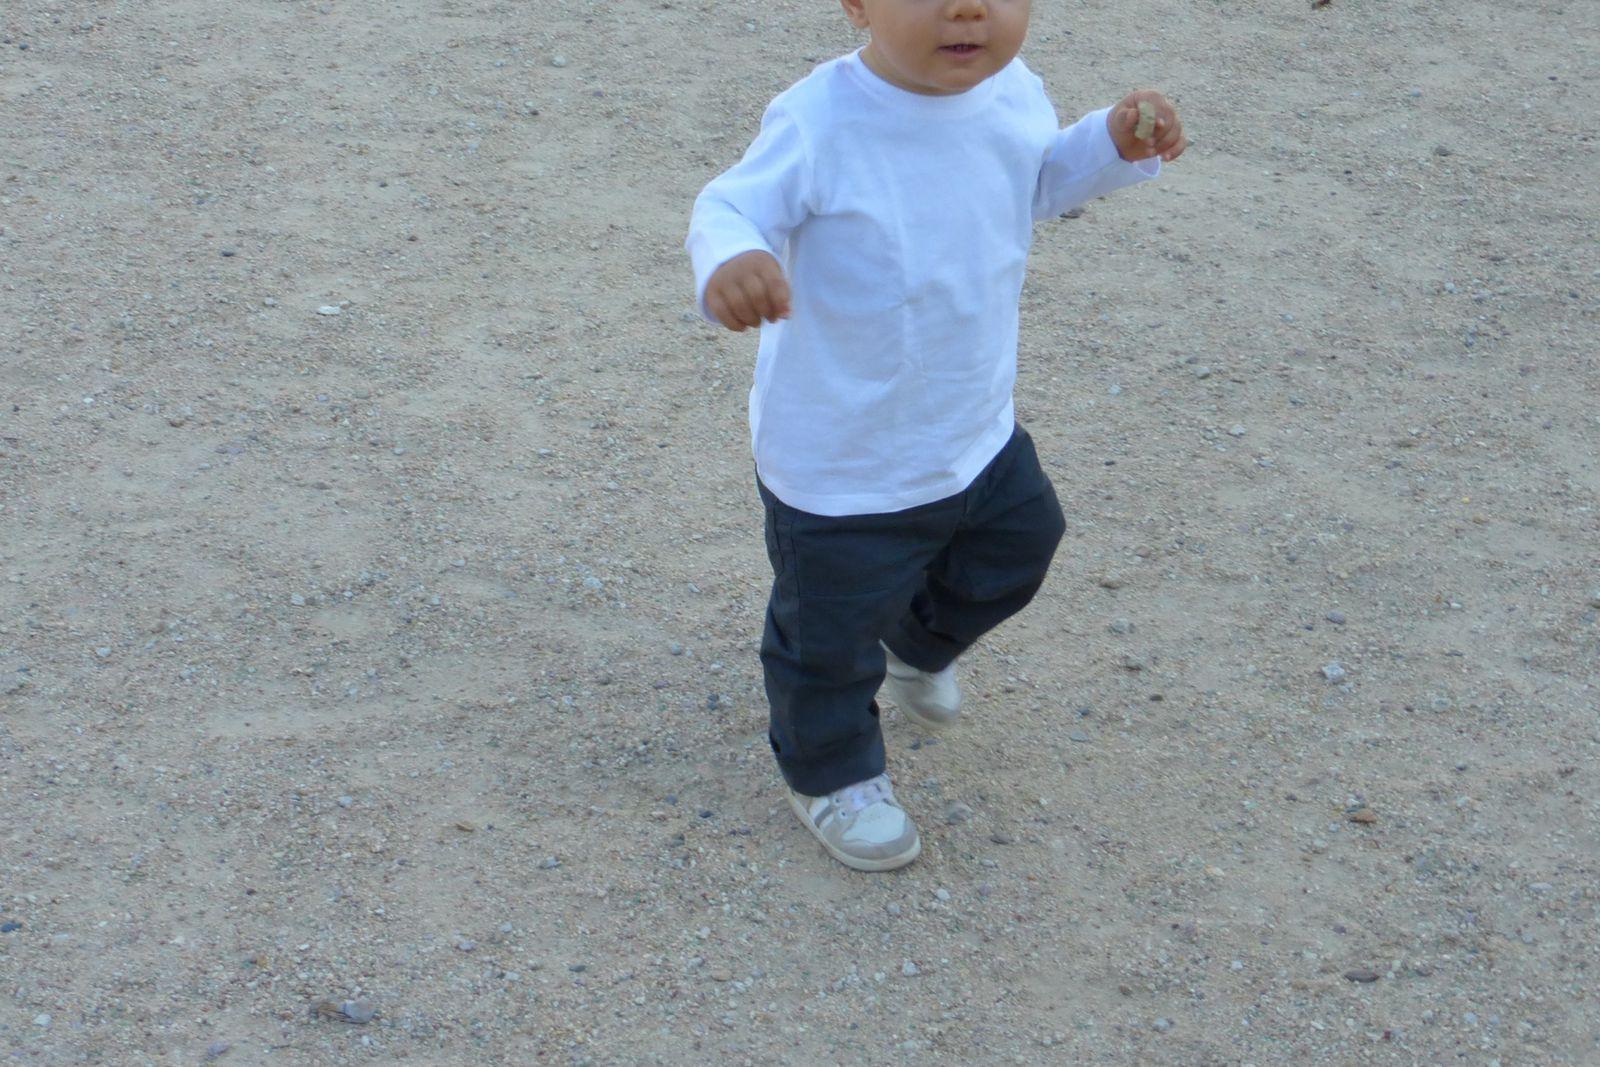 Tee-shirt blanc Zara Baby, pantalon marron Kimbaloo , chaussettes blanches Tape à l'œil, baskets Zara.